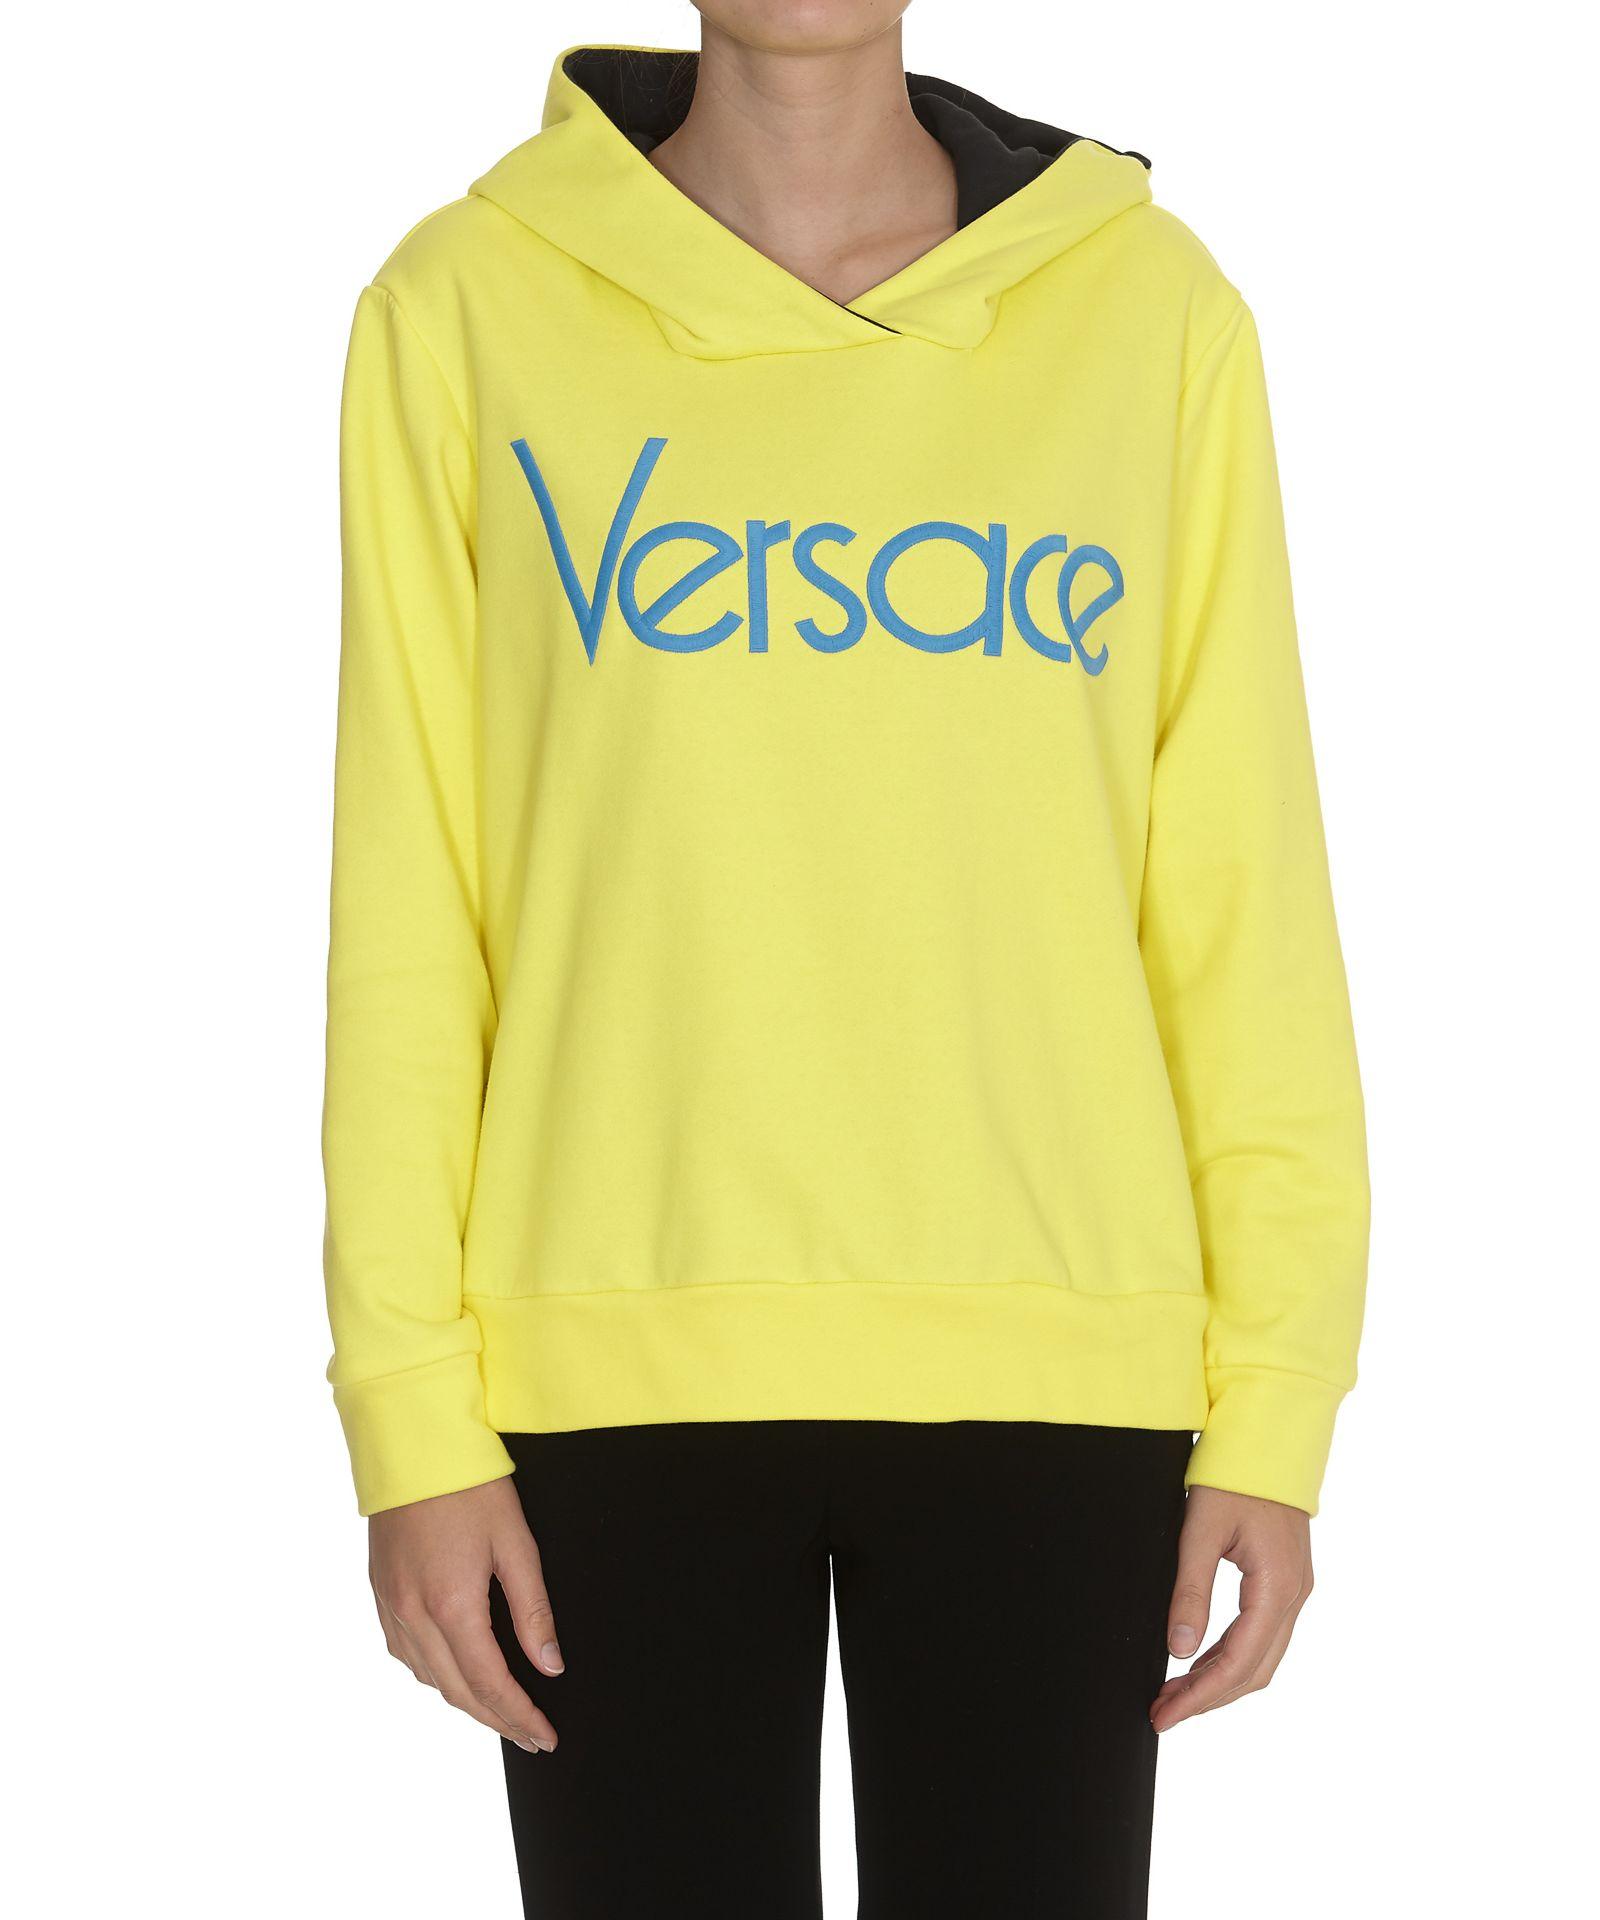 versace -  Logo Sweatshirt